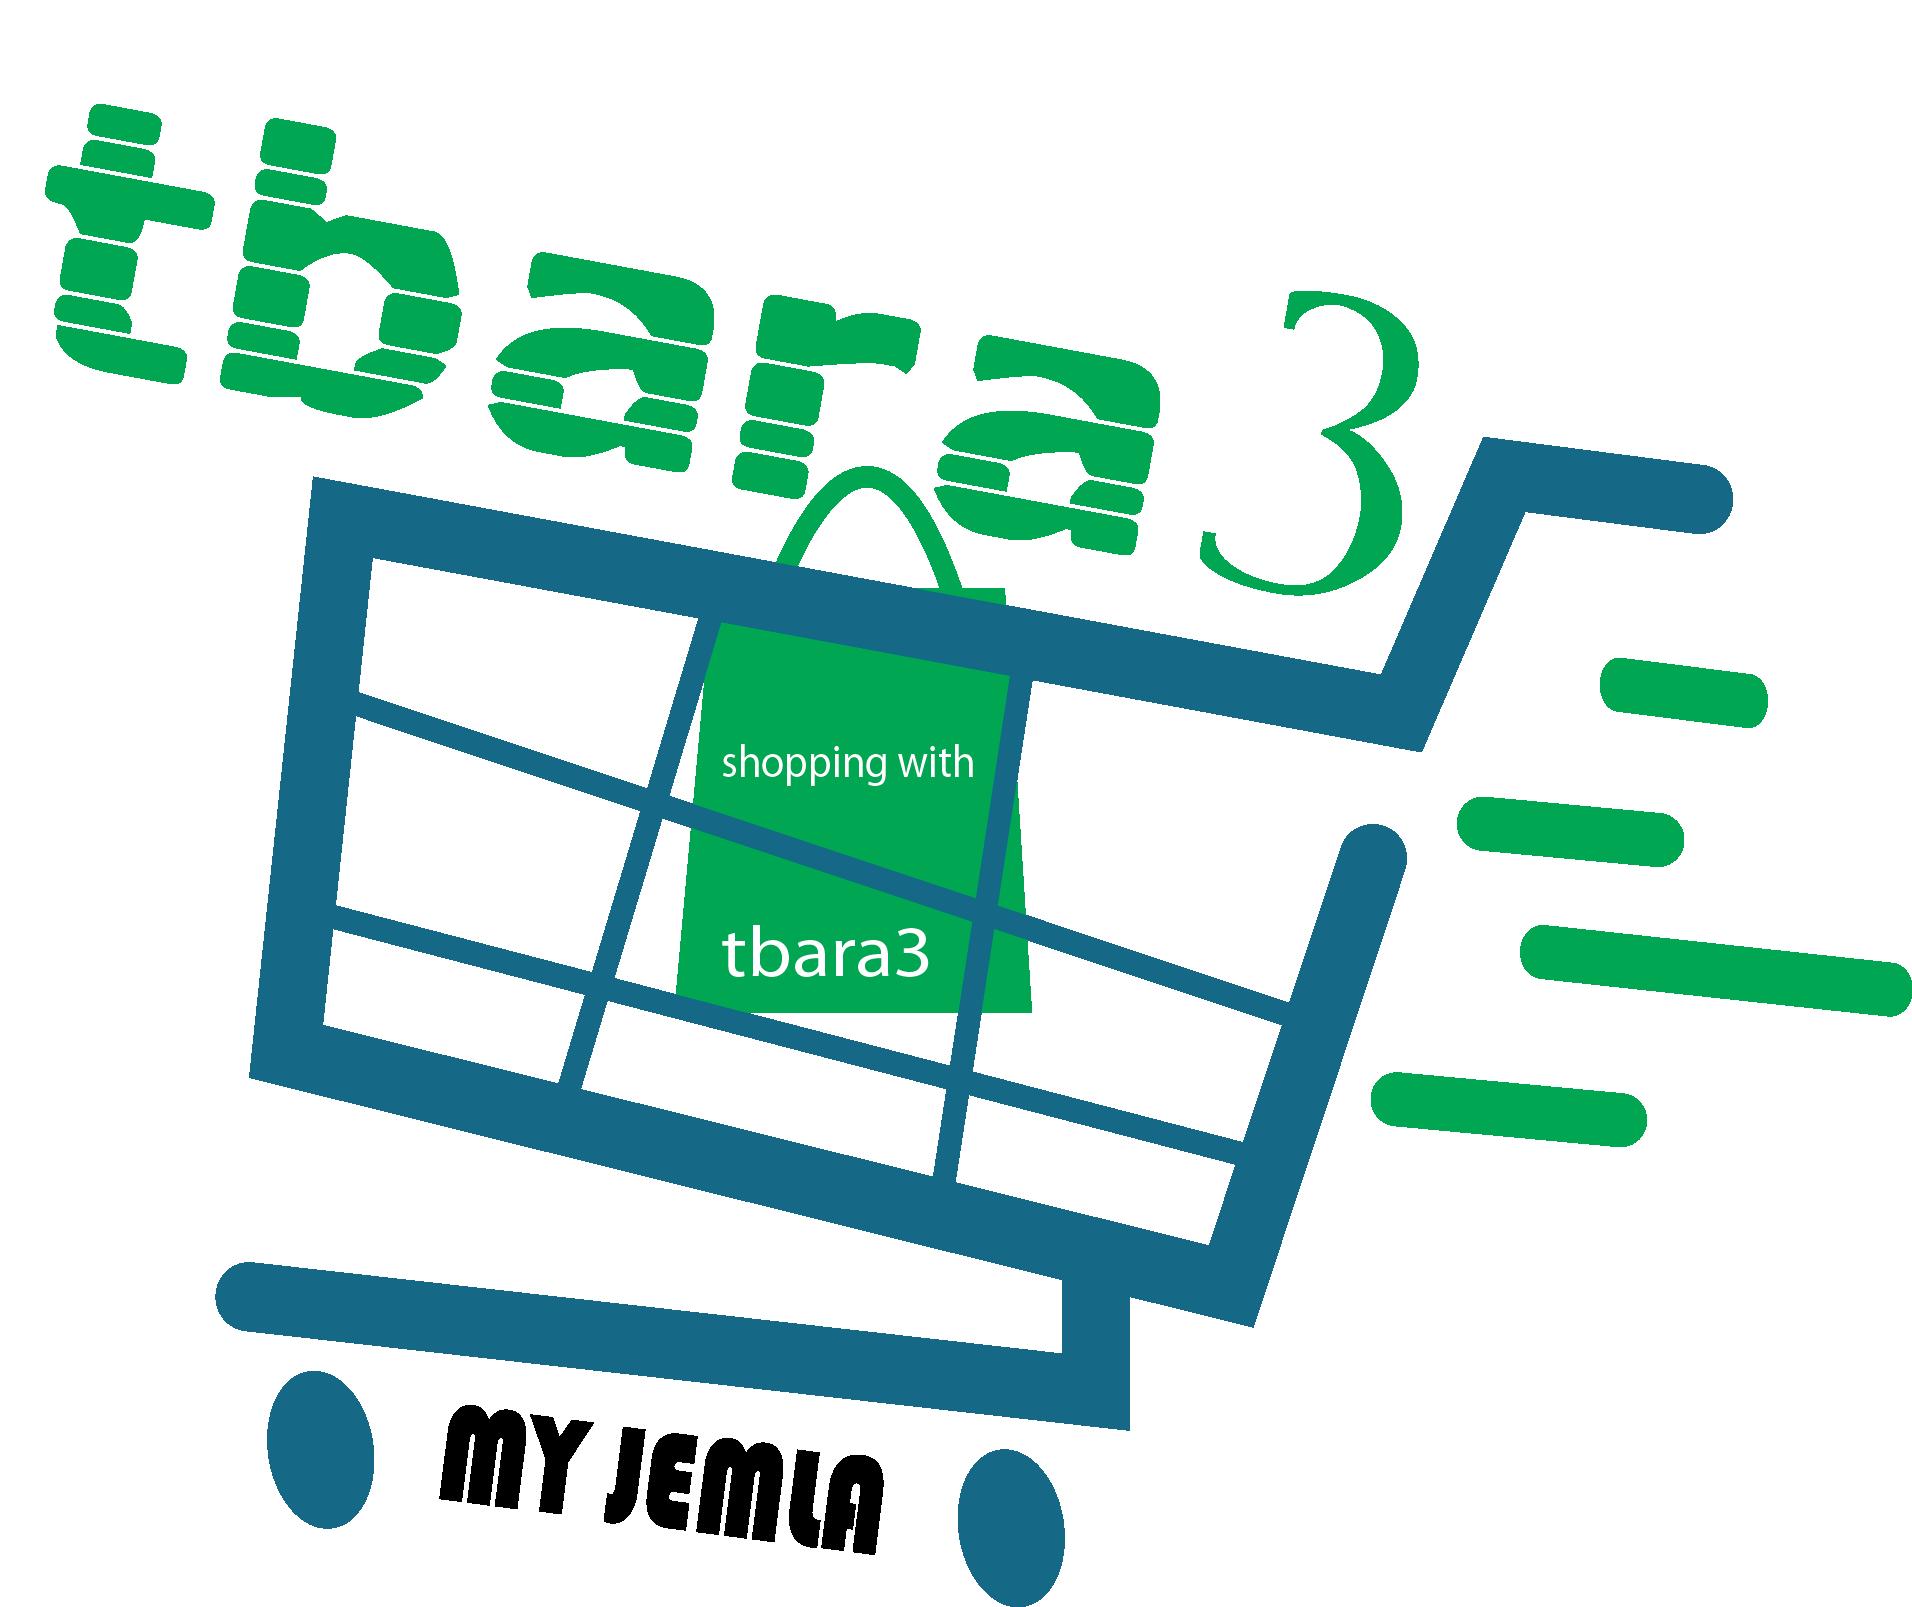 tbara3